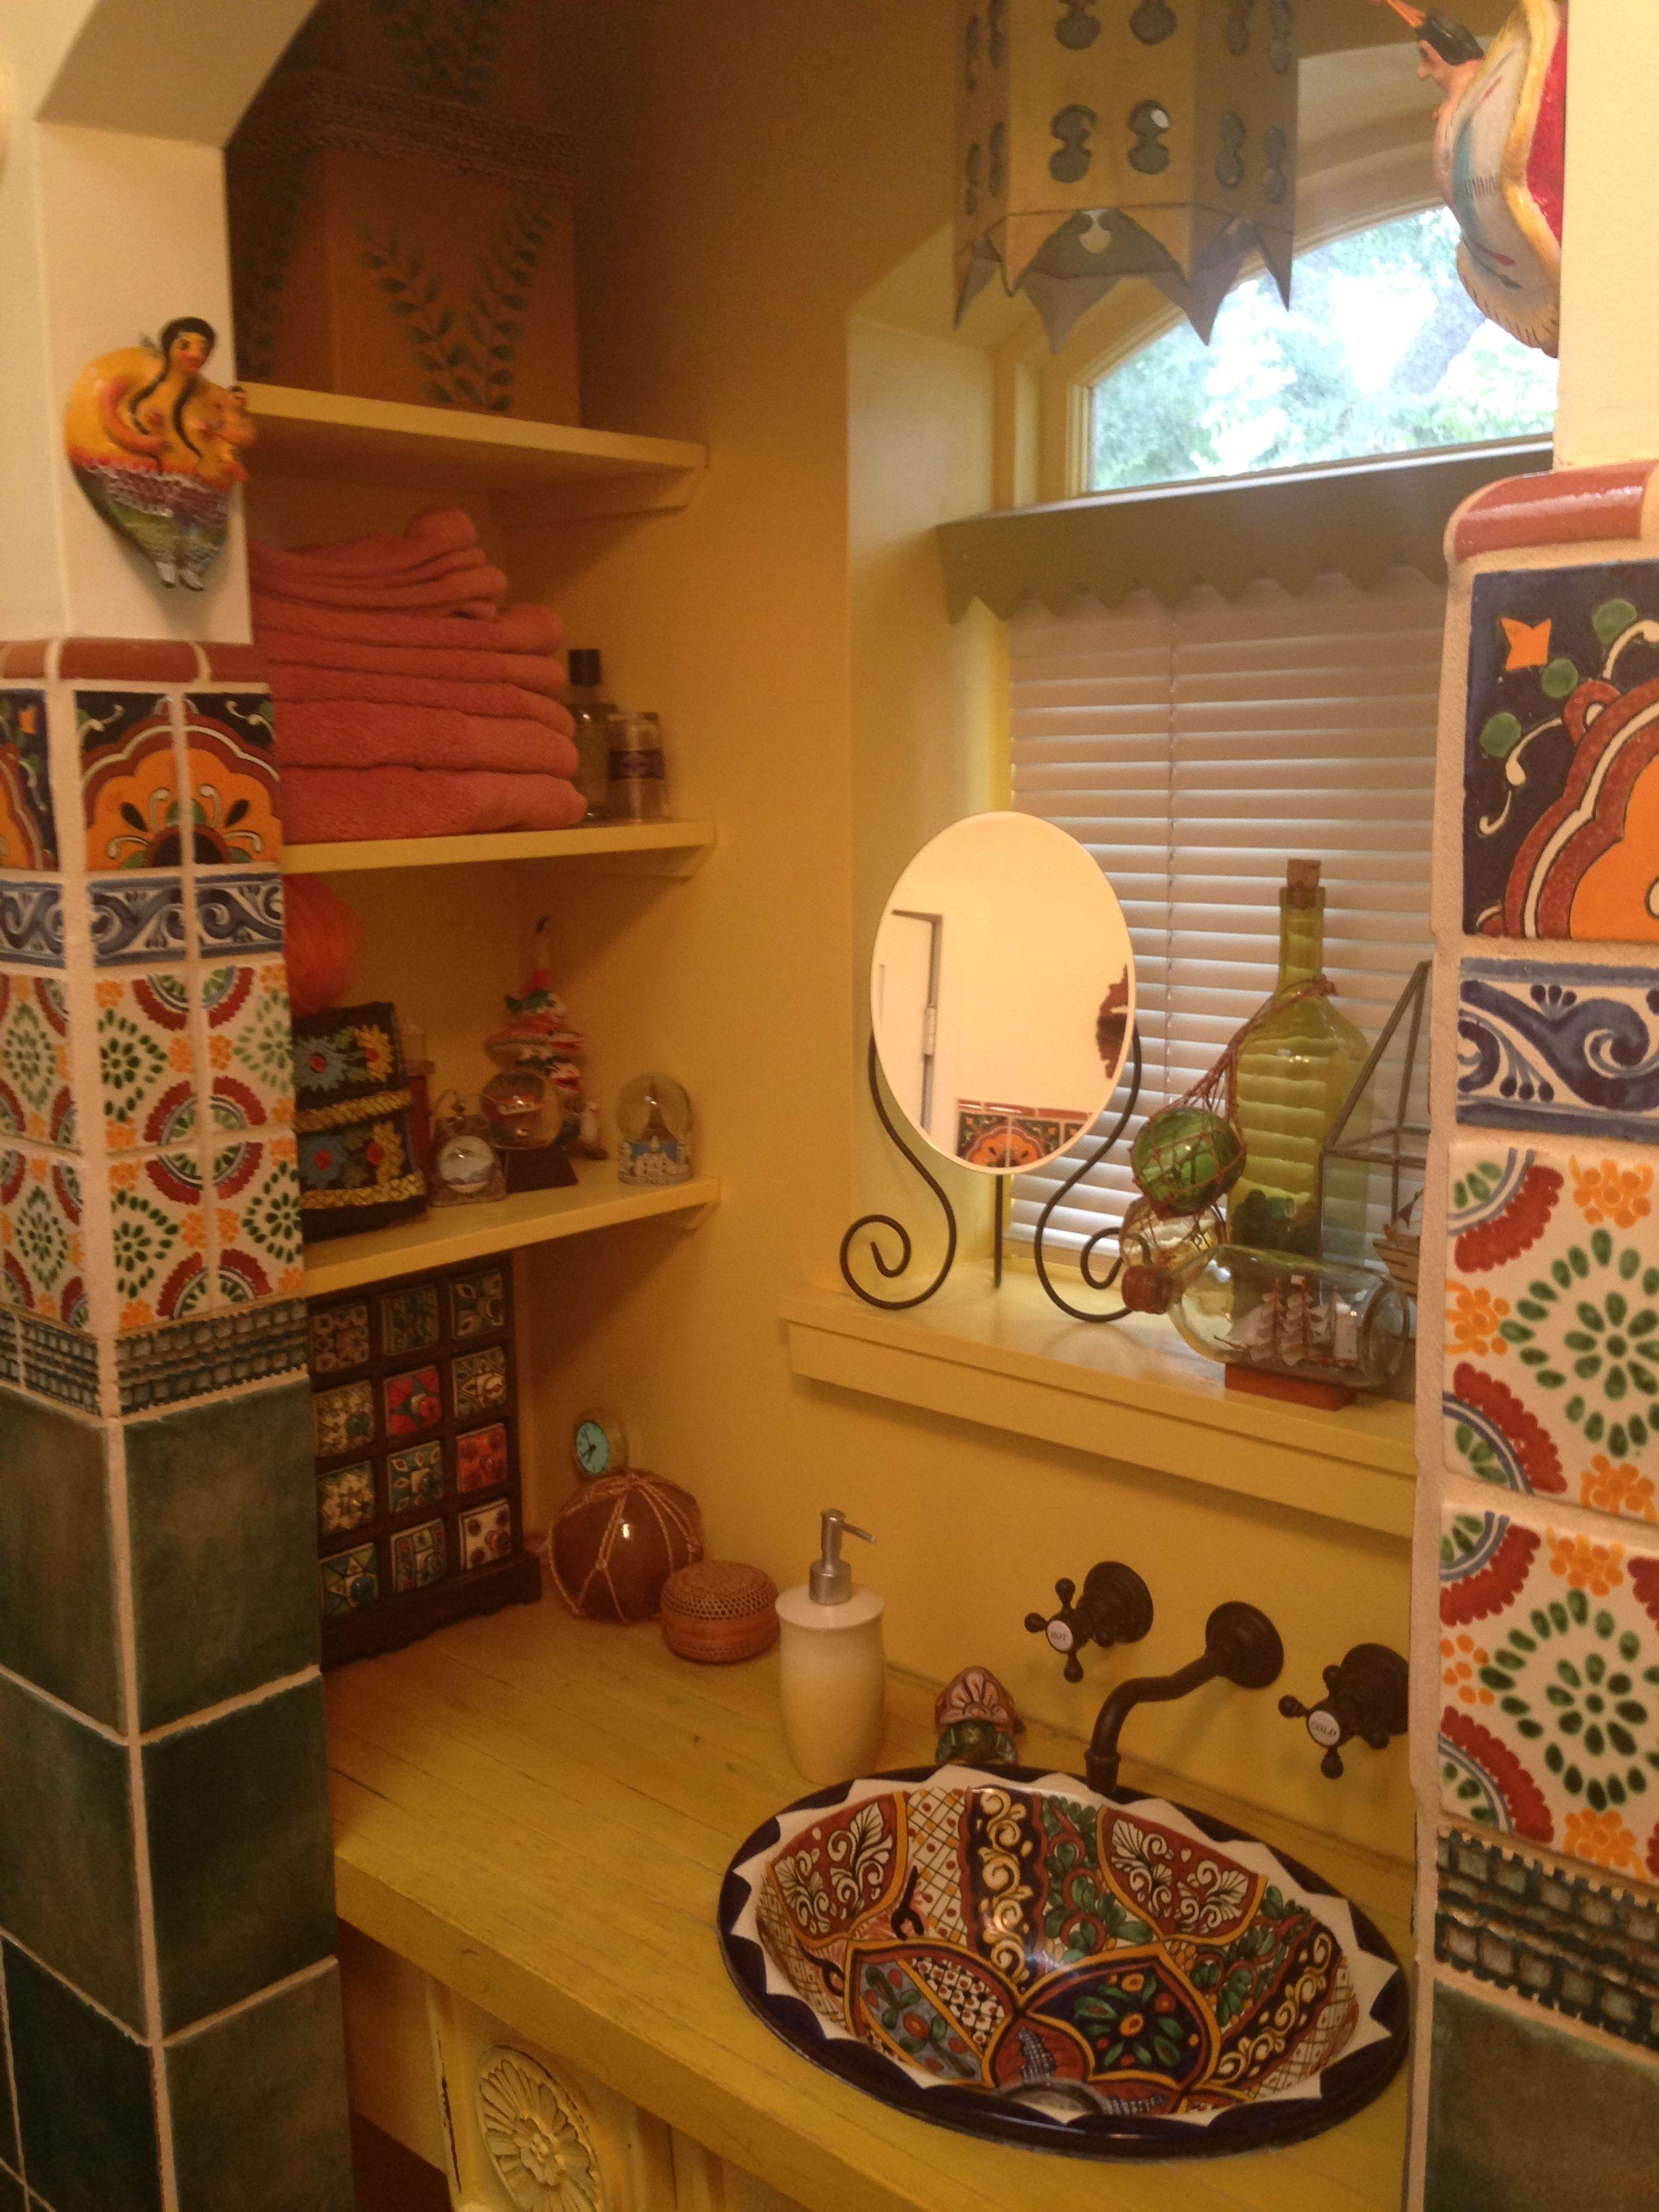 Mexican Tile Bathroom Designs - Google Search